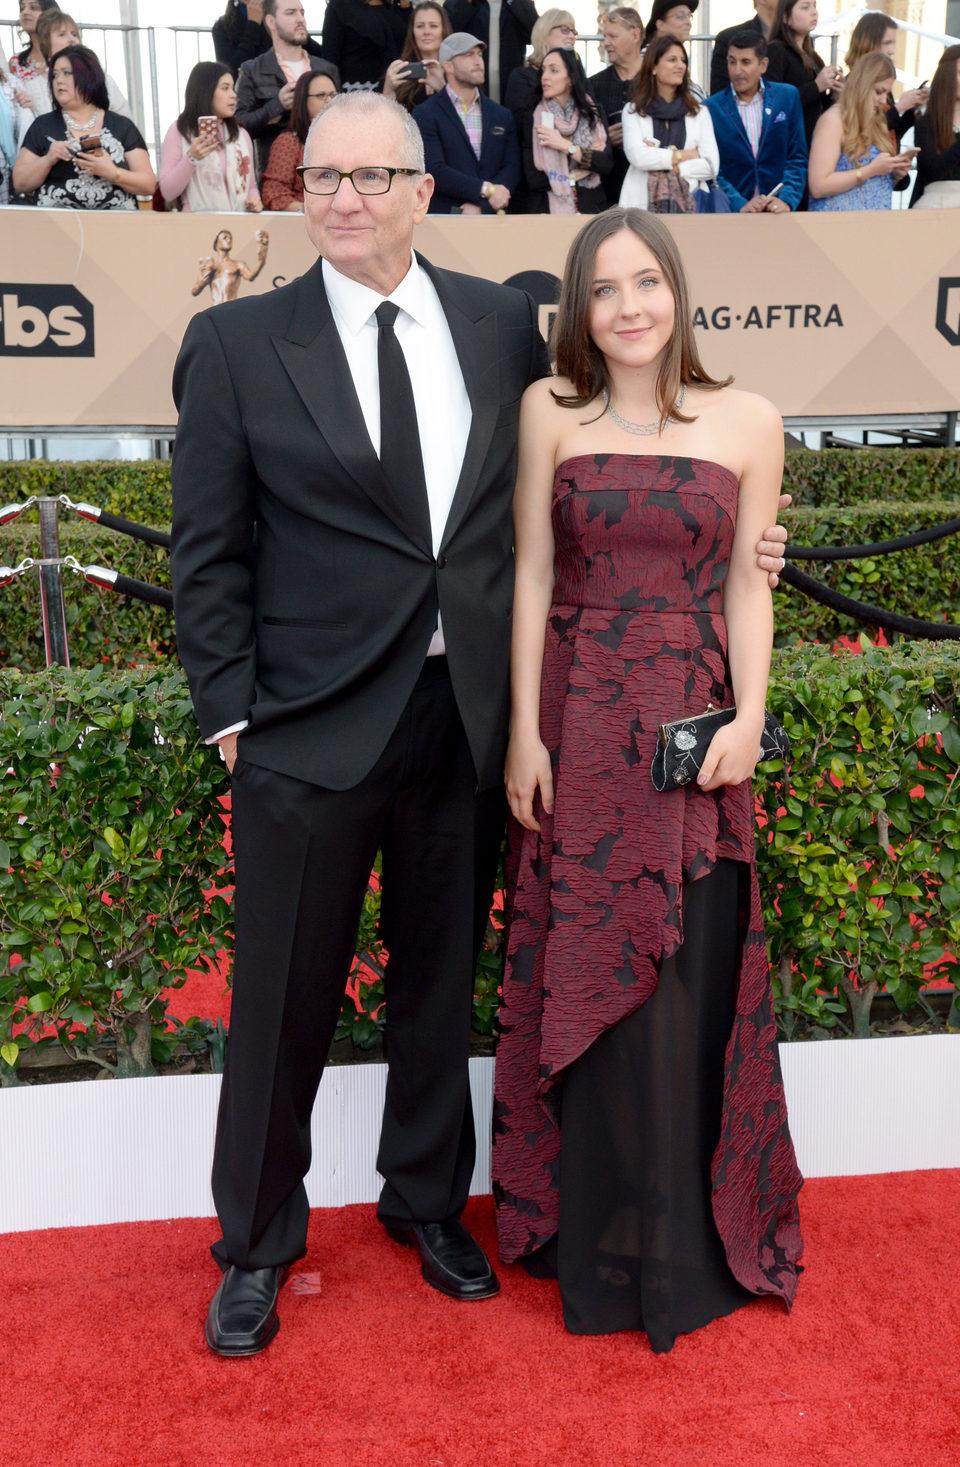 Ed O'Neill and Sophia O'Neill at the SAG Awards 2016 red carpet